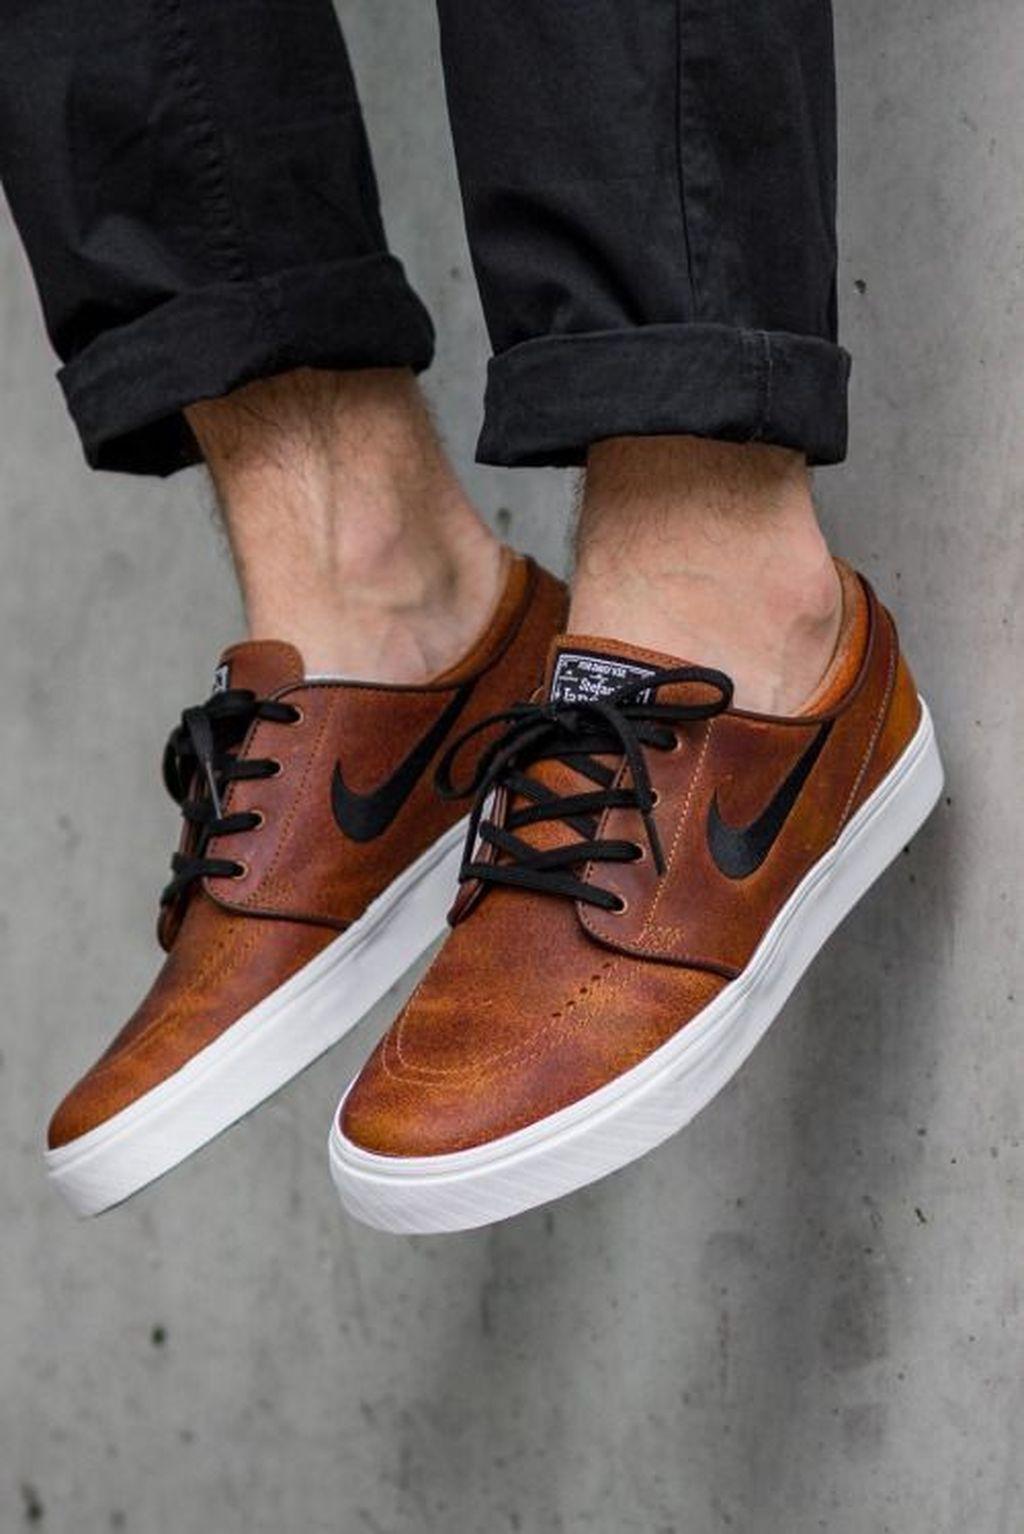 45++ Mens nike skate shoes ideas ideas in 2021